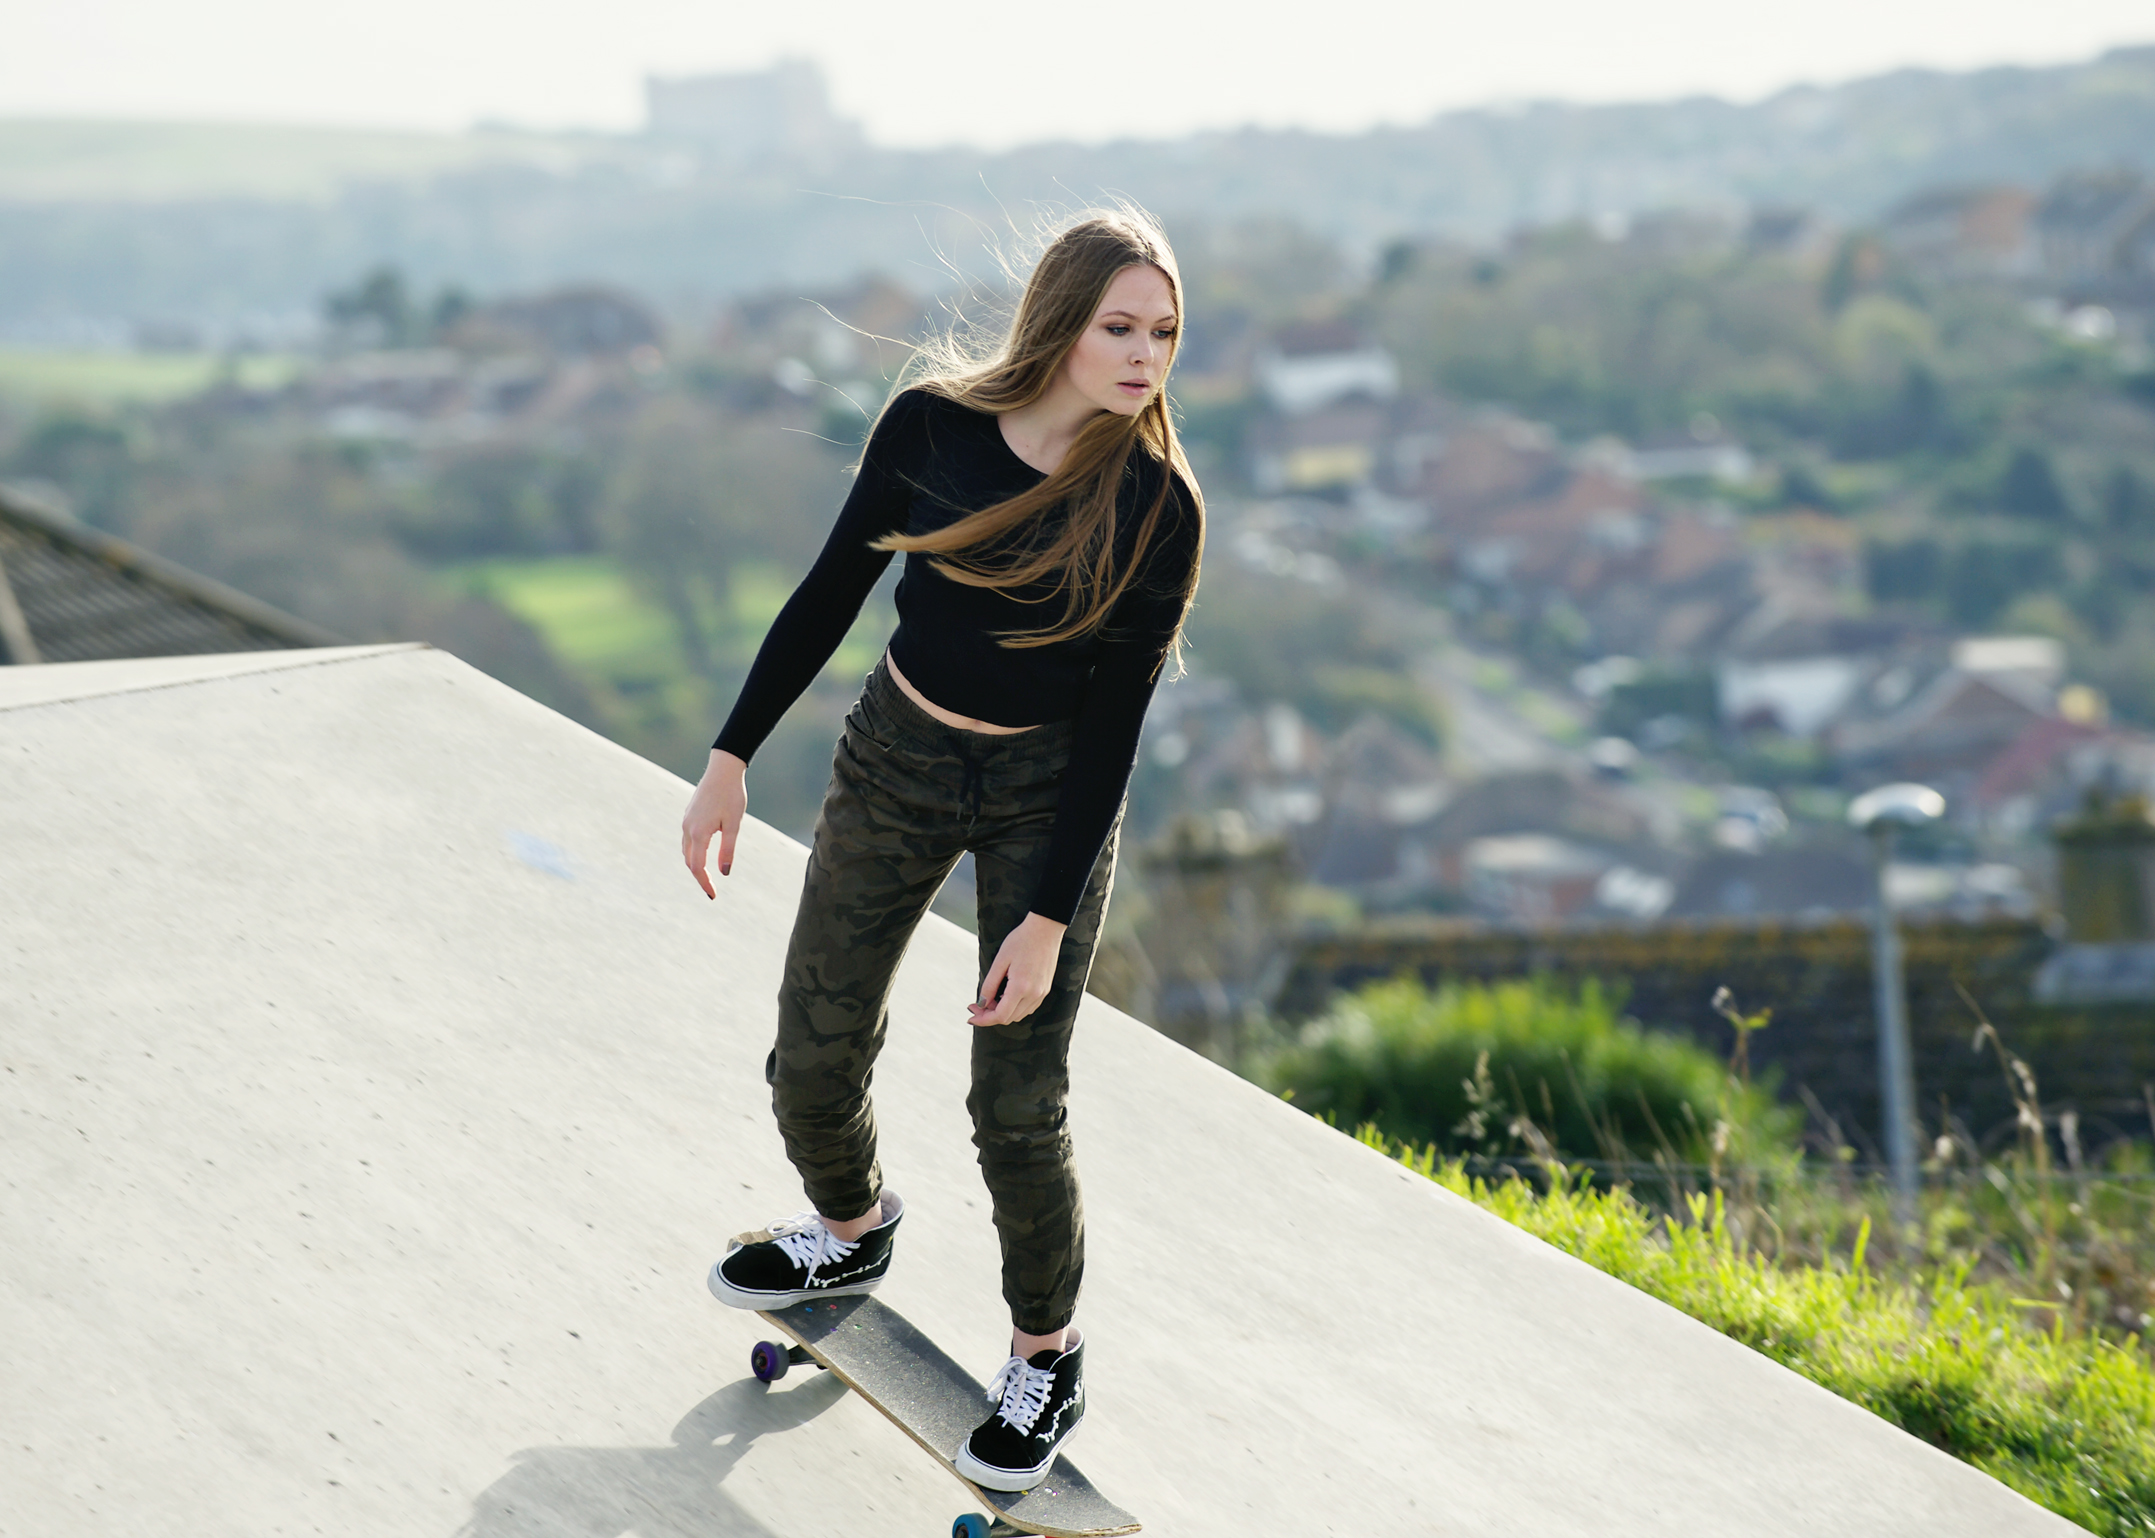 Jessie for MK Model Management